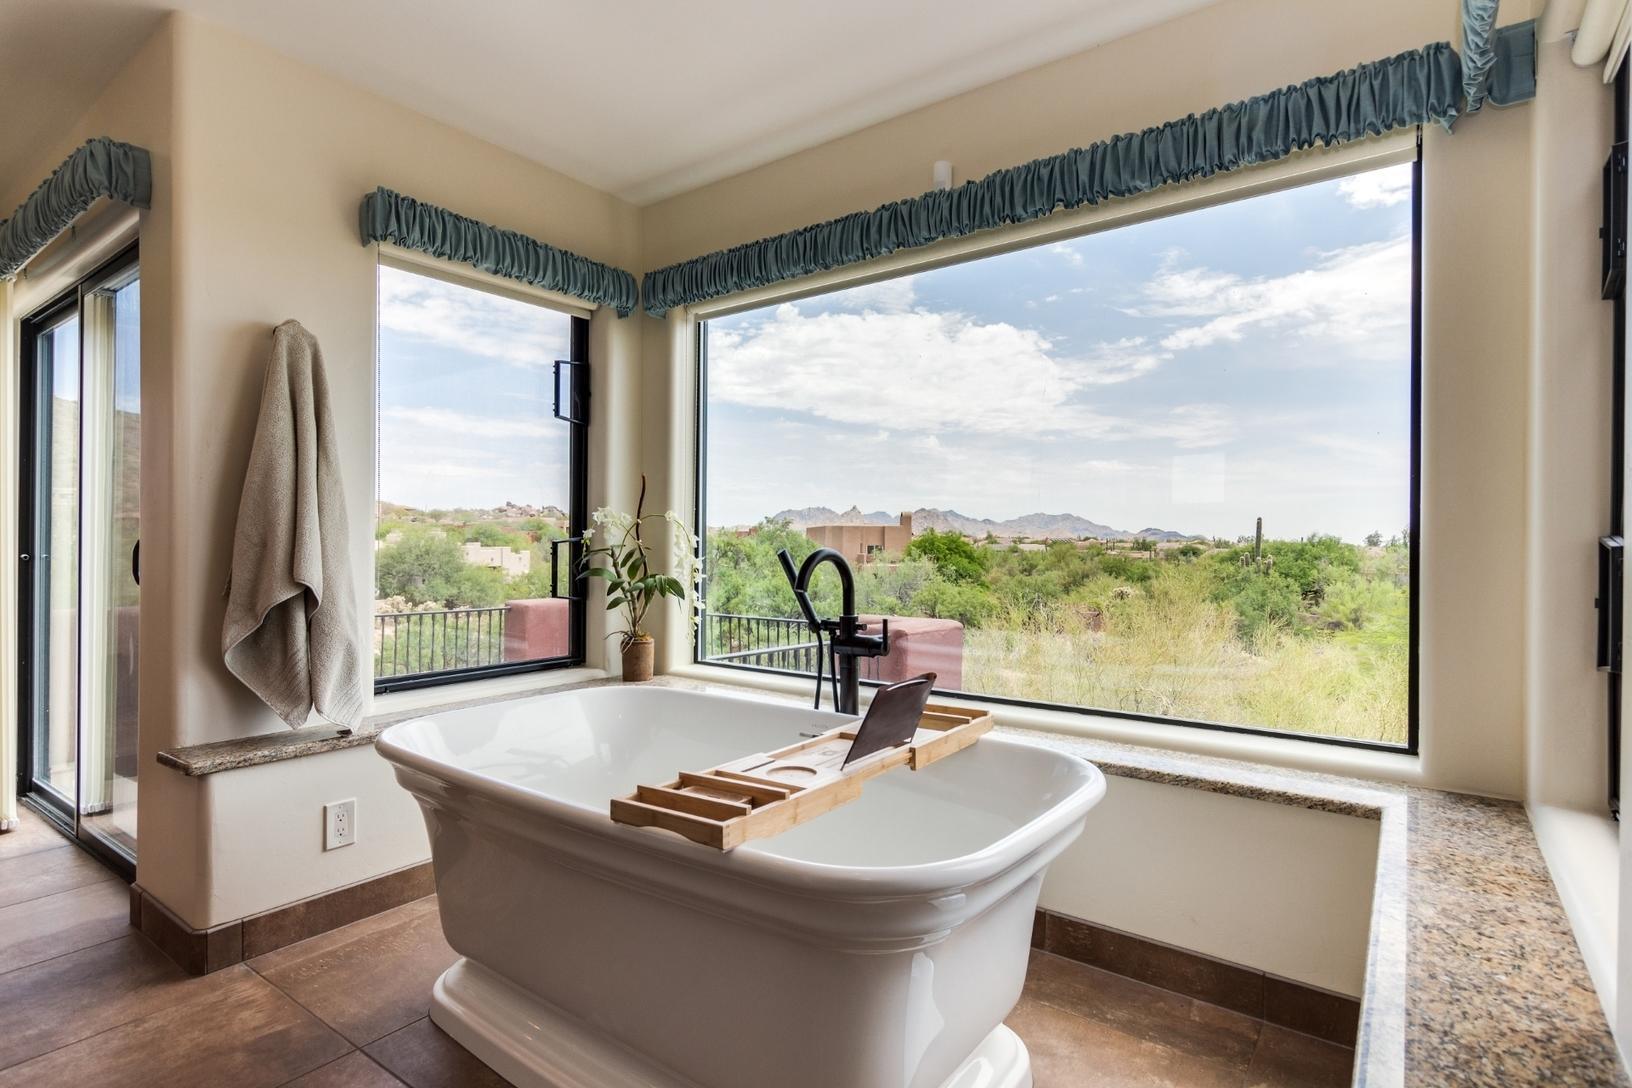 North Scottsdale Bathroom Remodeling 85266